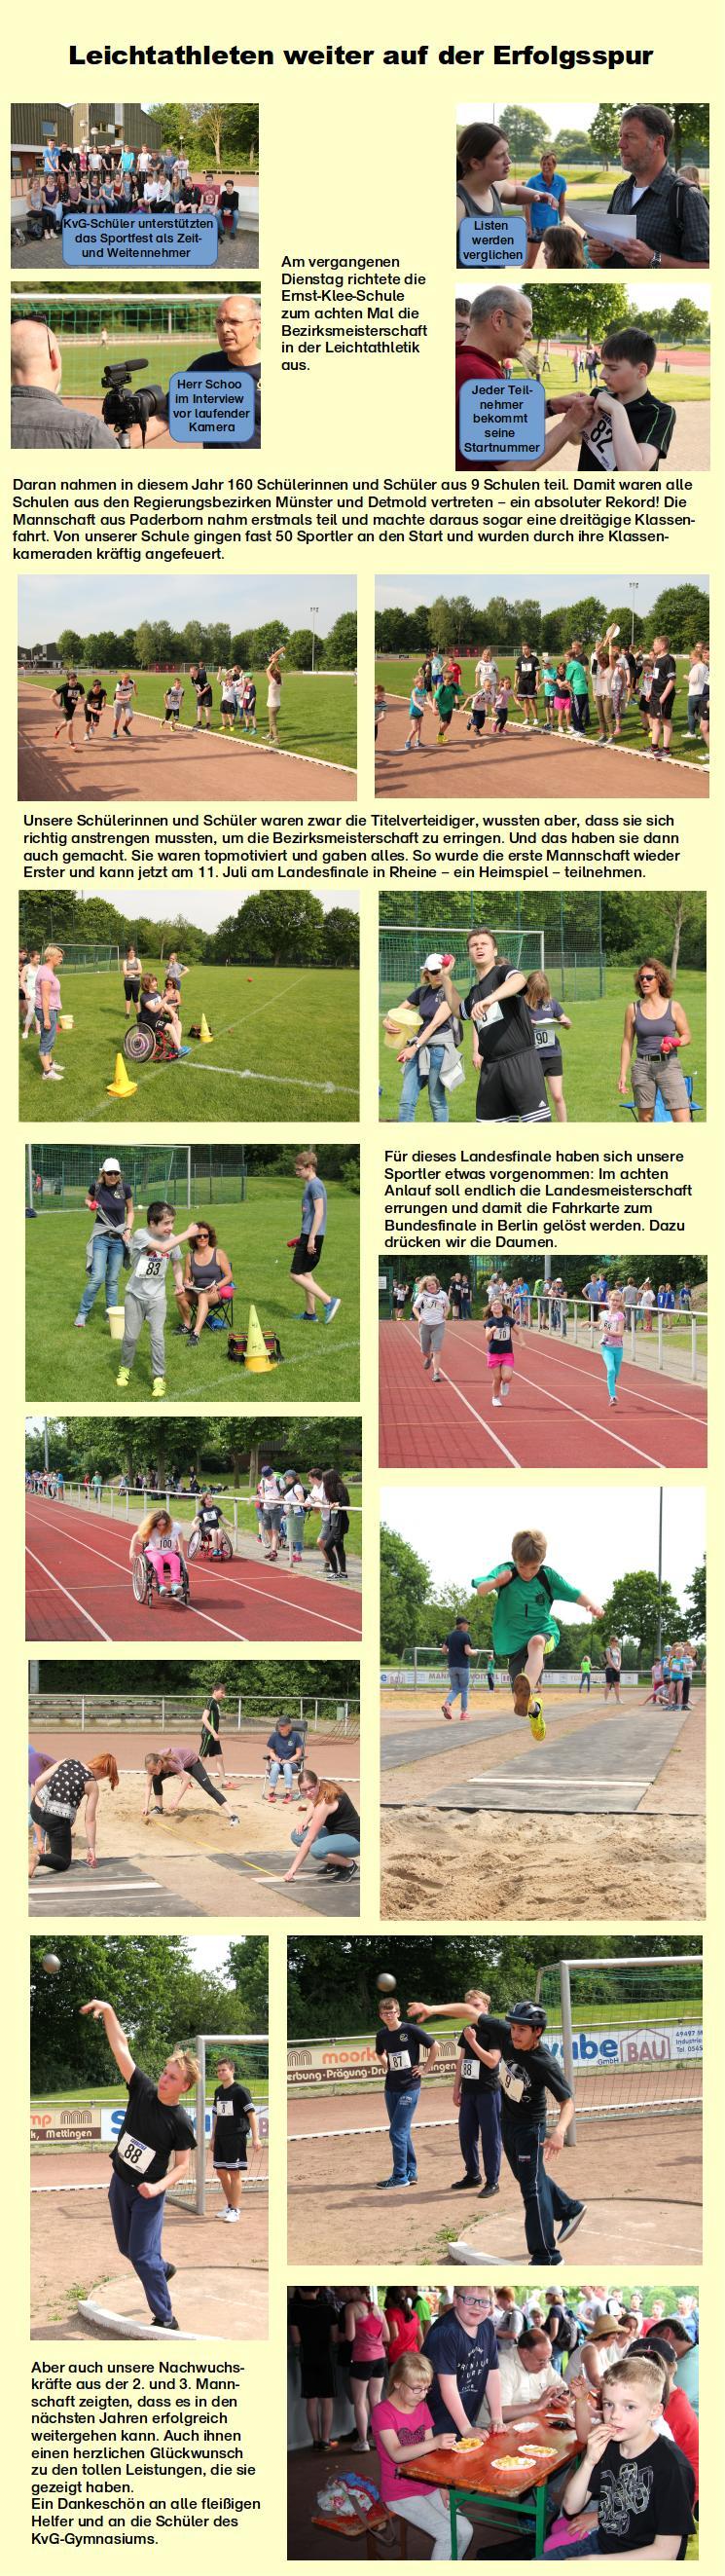 Leichtathleten 17